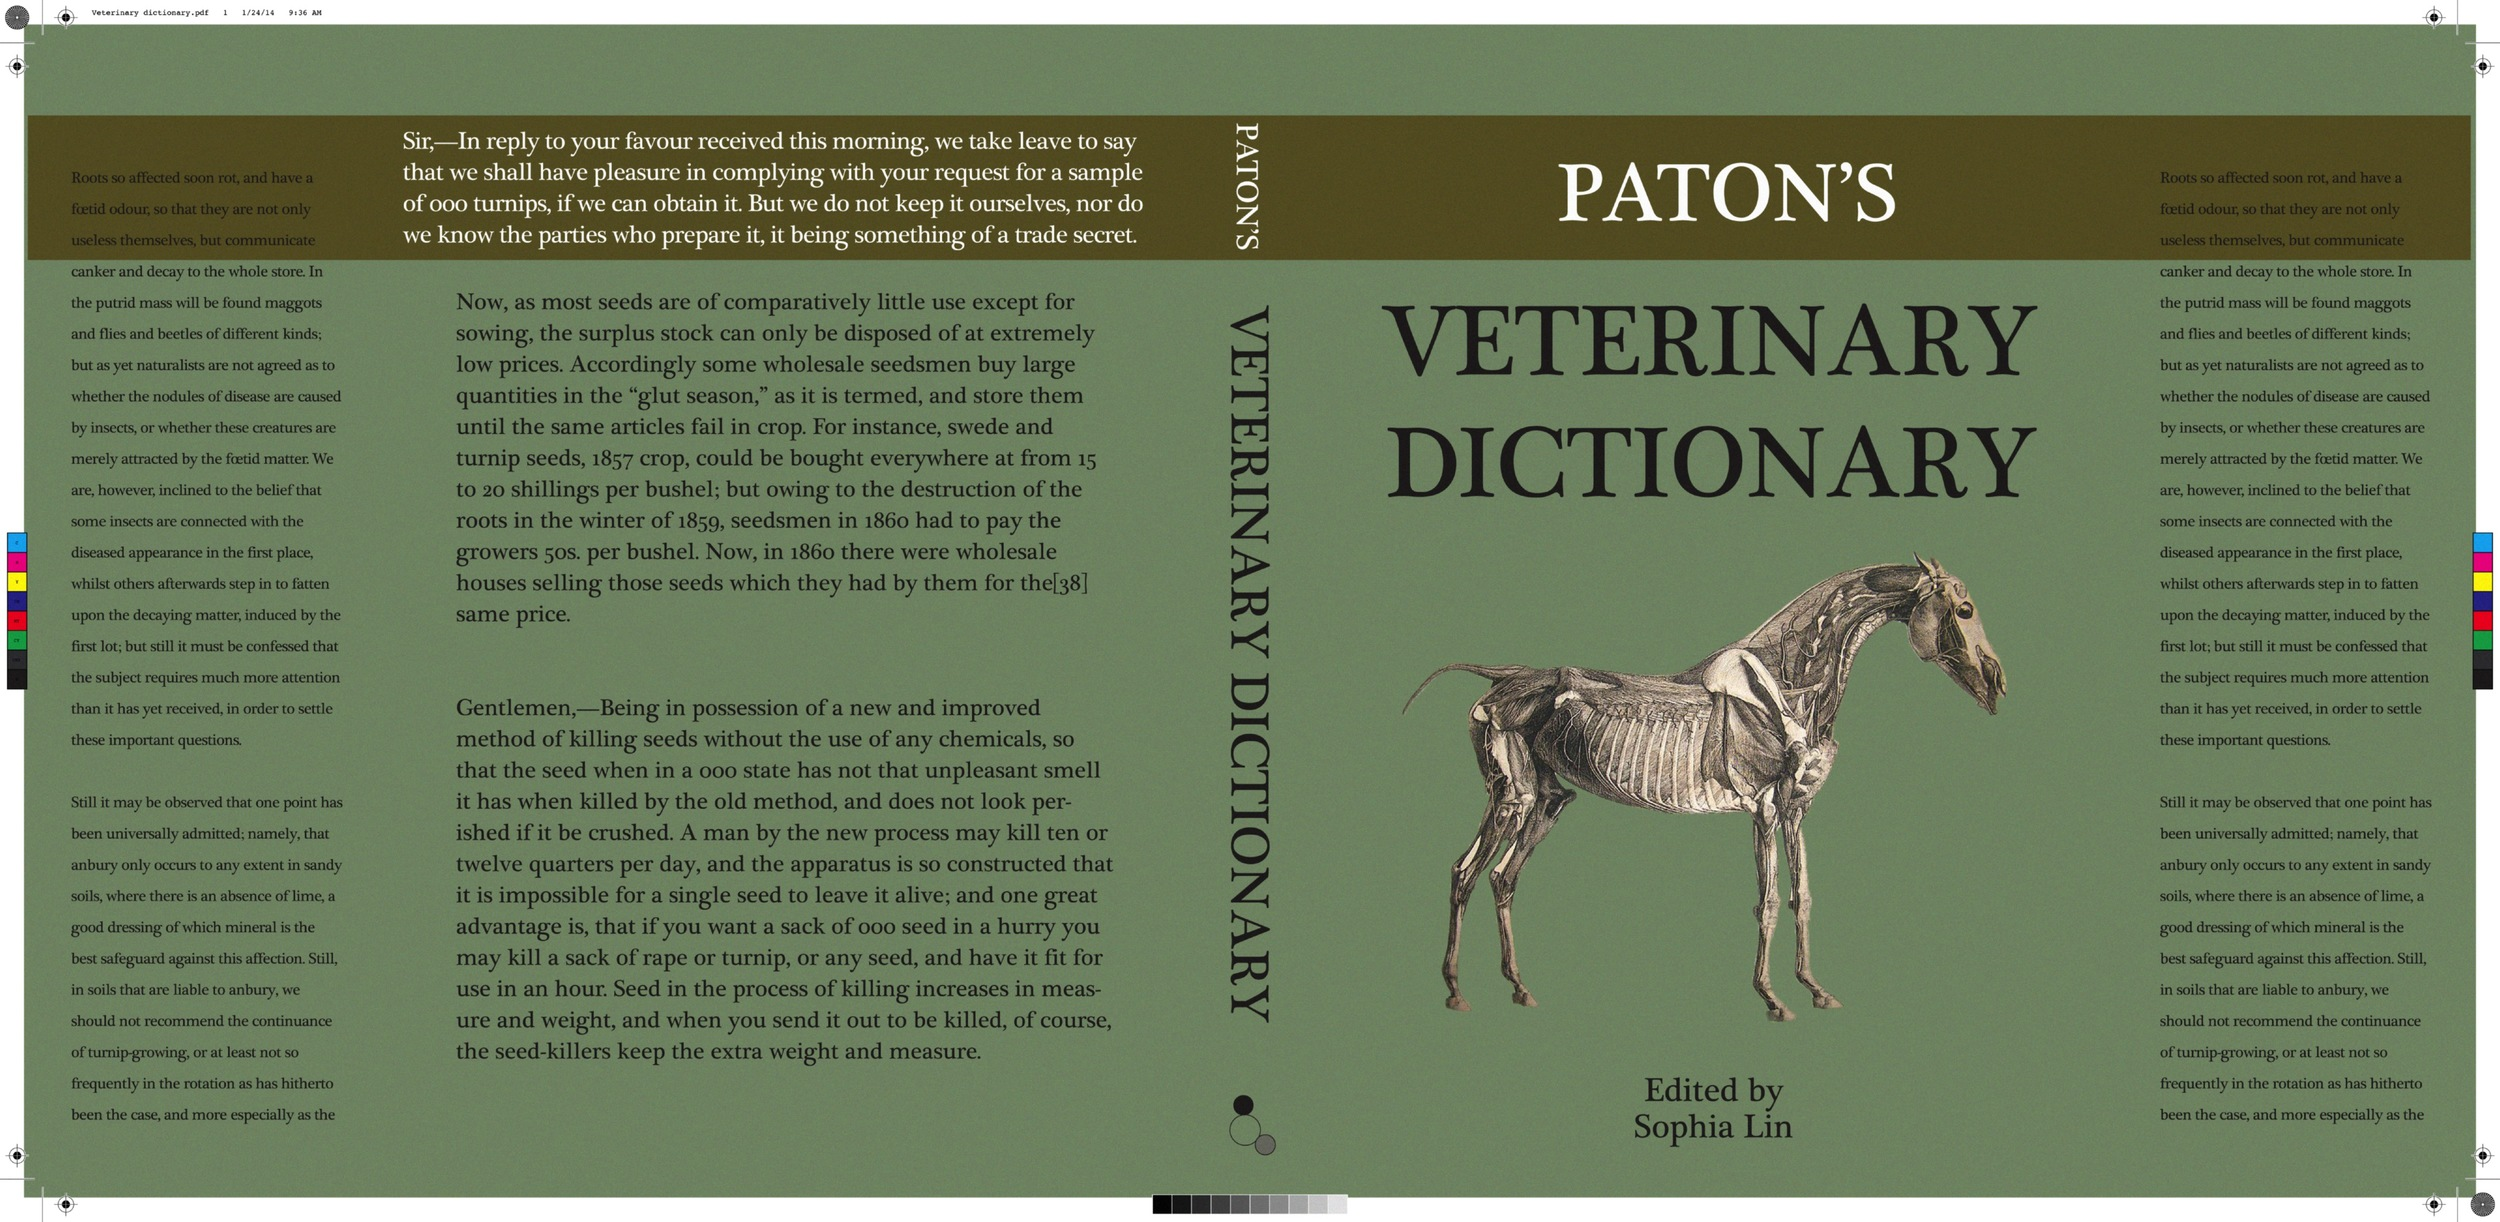 Veterinary dictionary copy.jpg